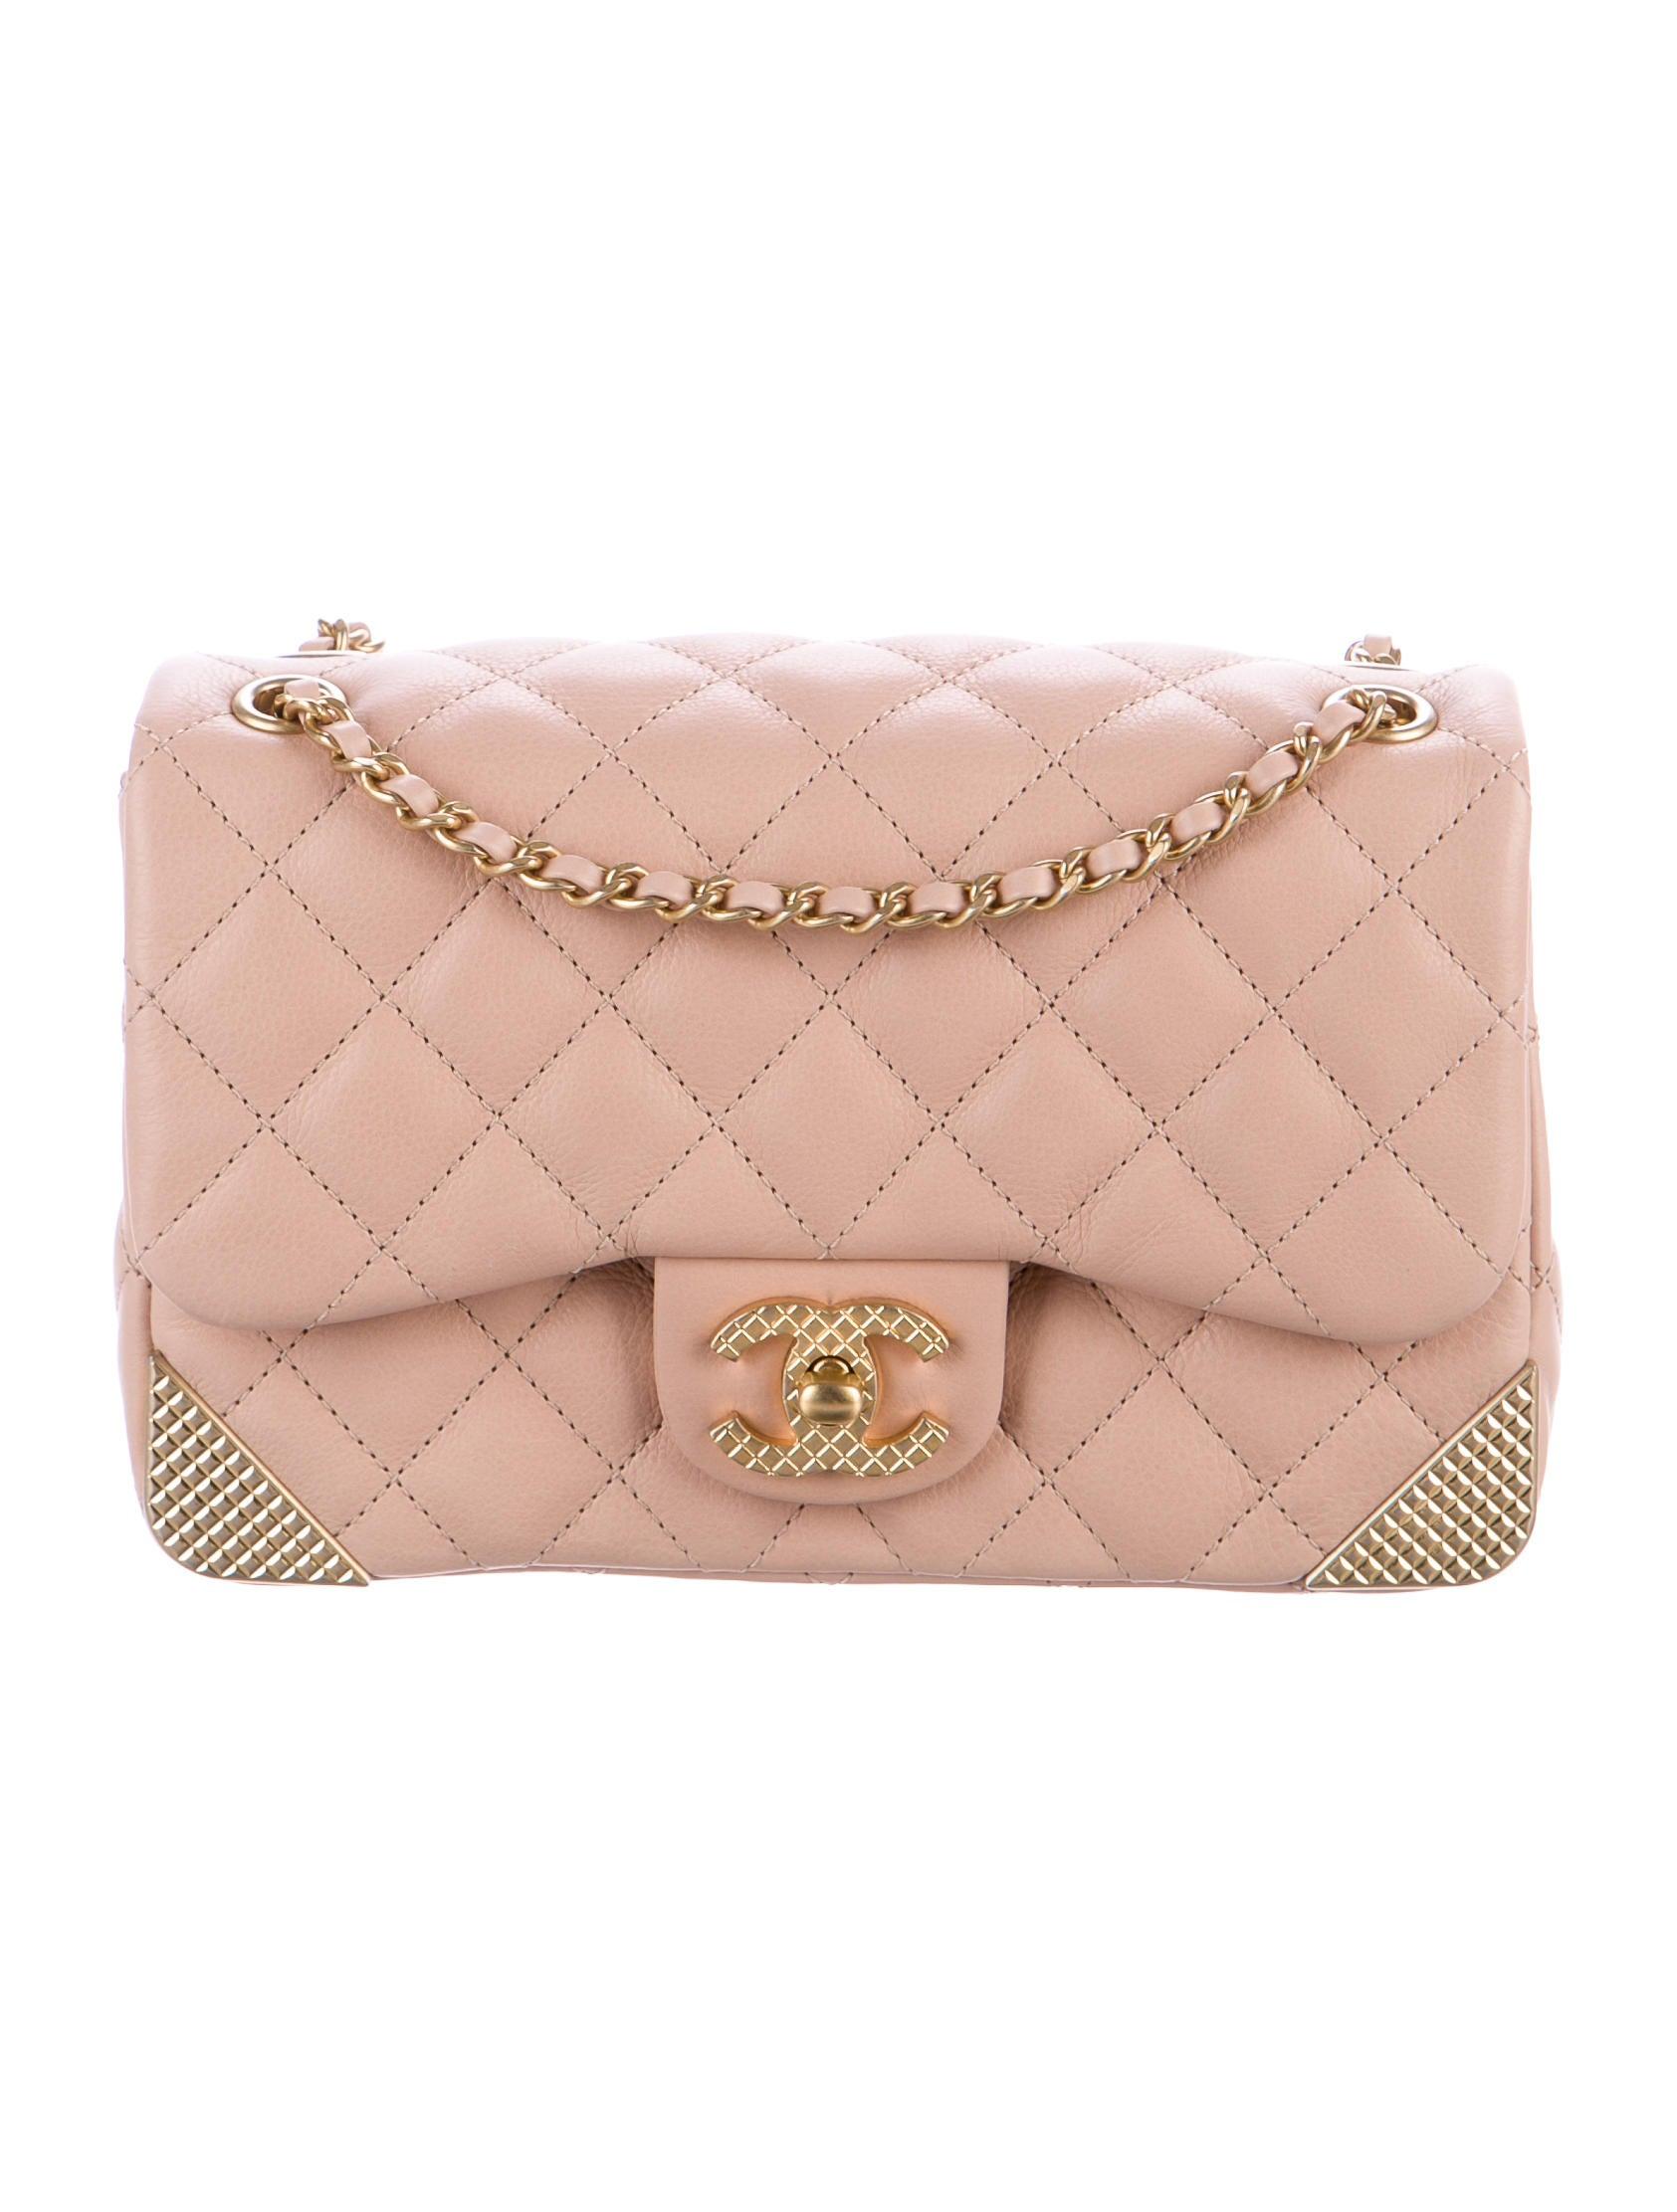 a9ad0bd56bce Chanel 2017 Studded Corners Flap Bag - Handbags - CHA219502 | The ...